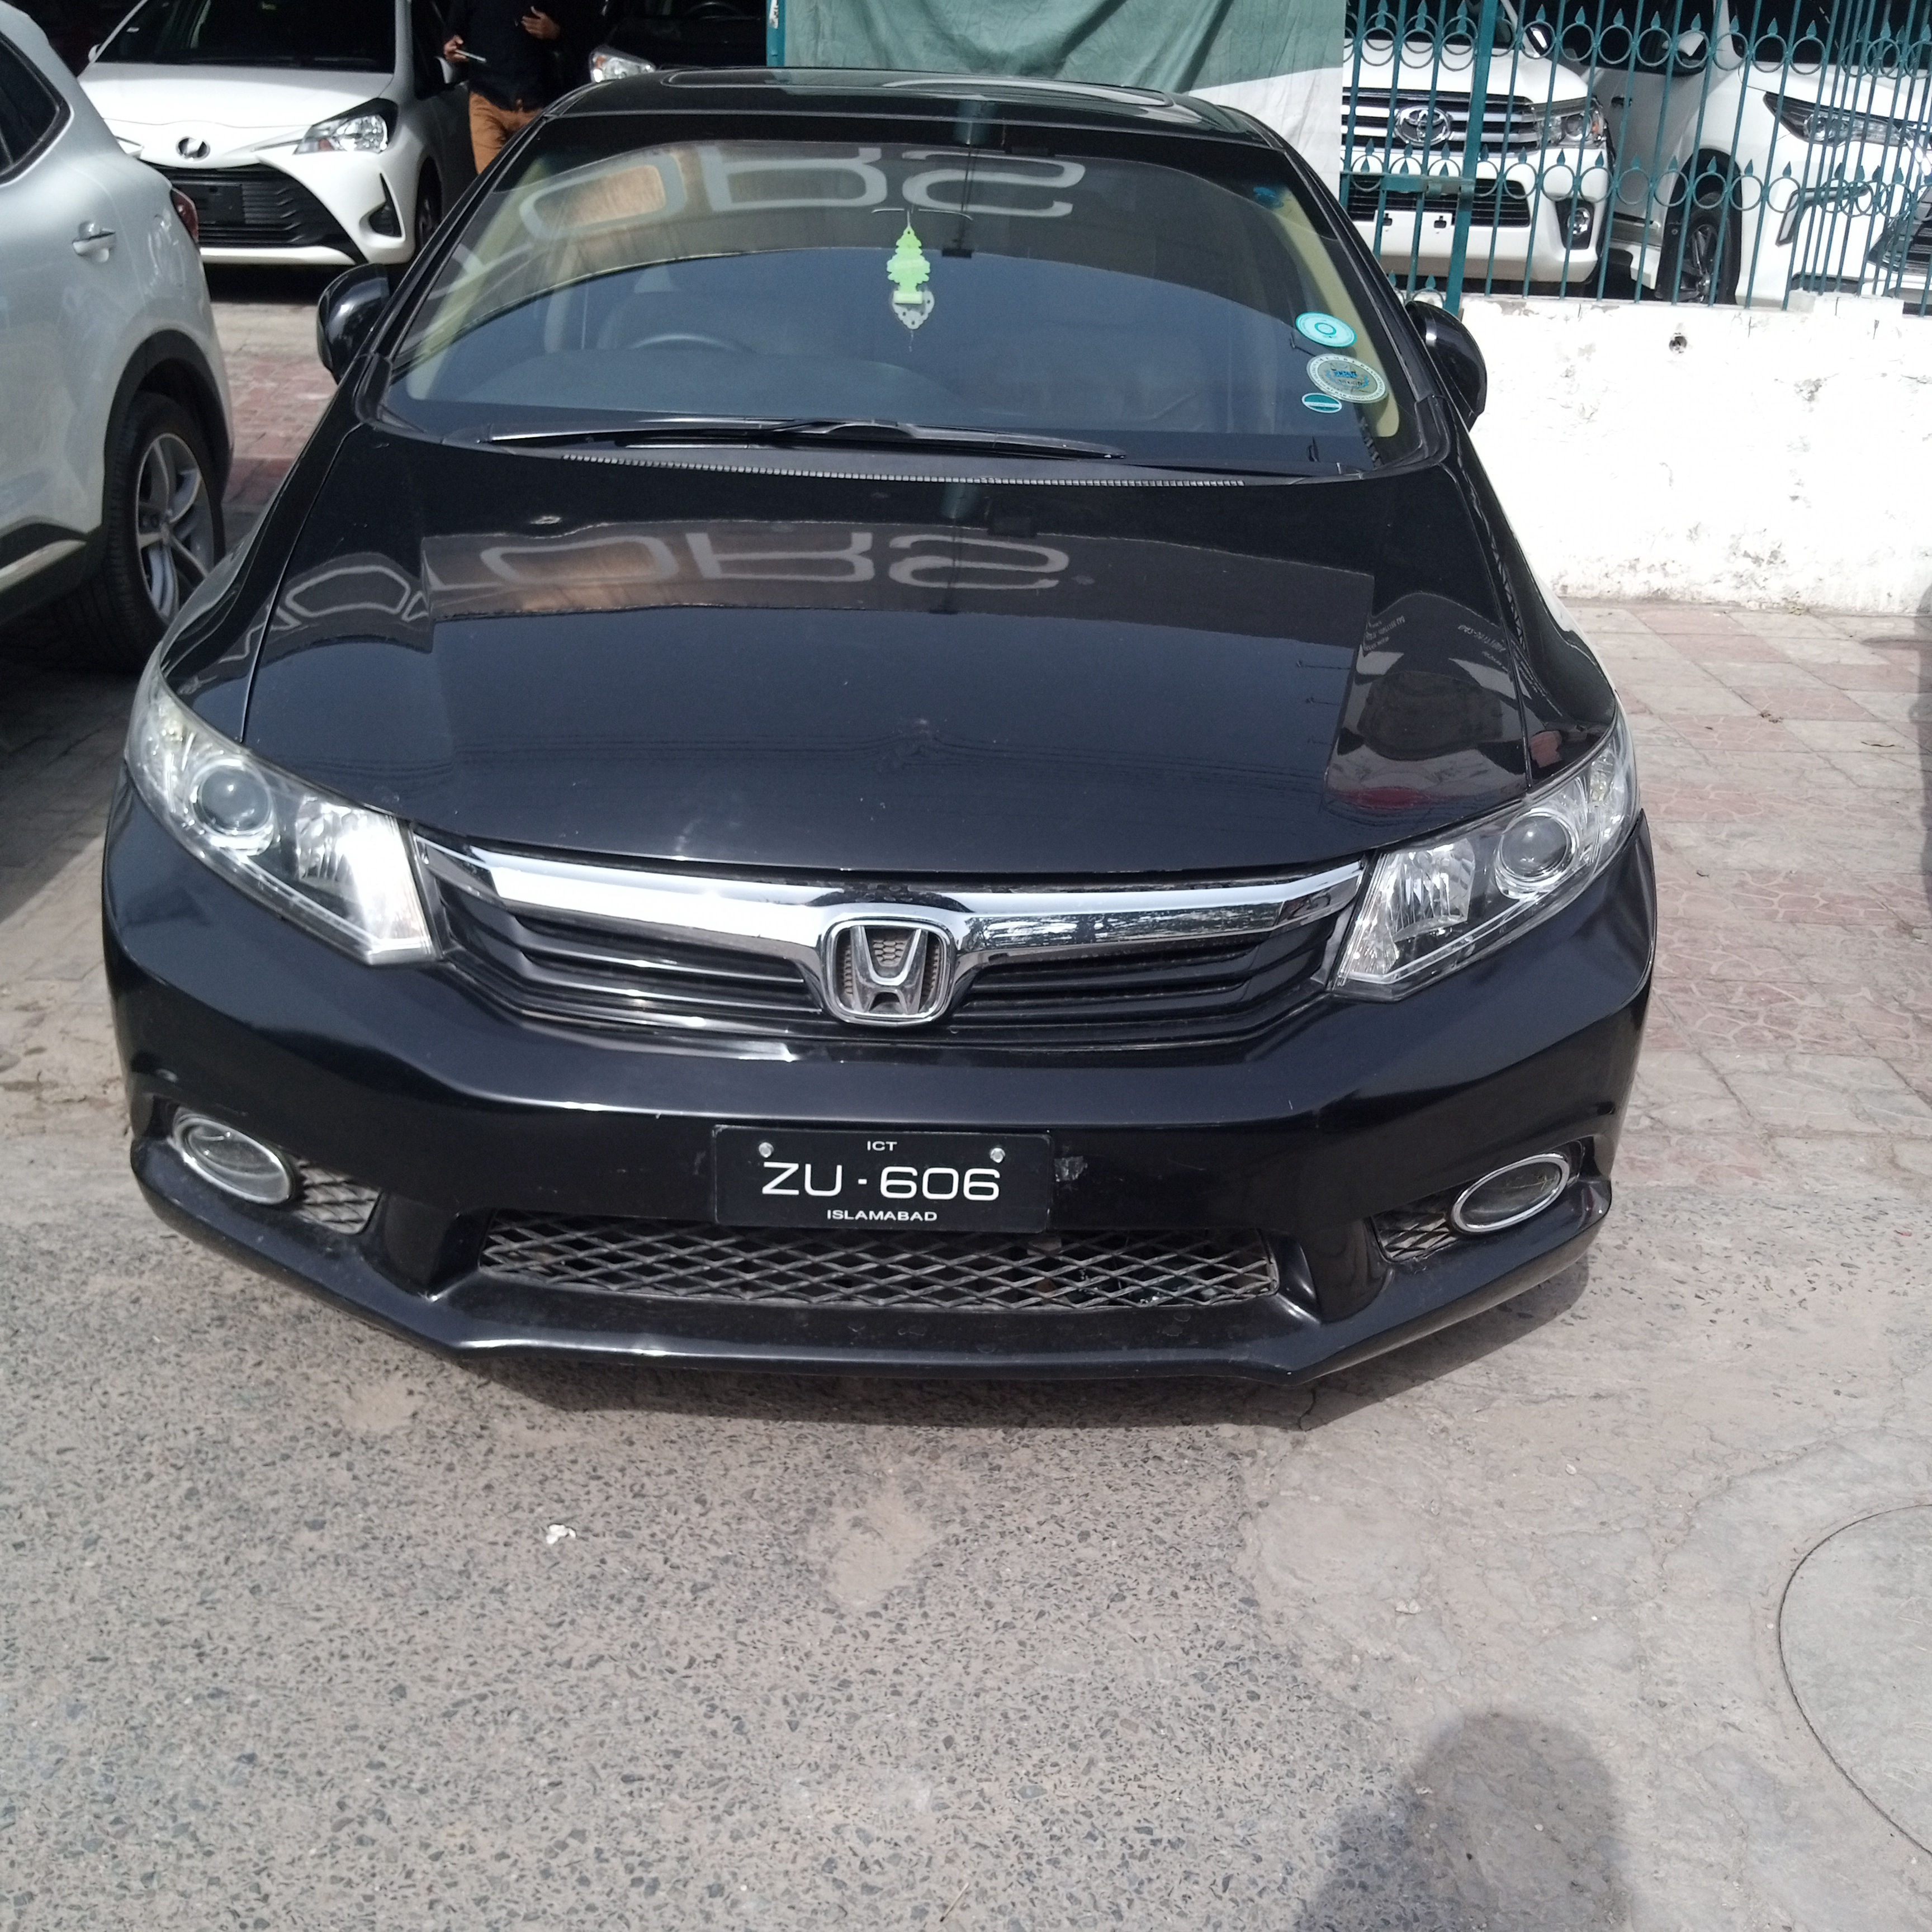 Honda Civic VTi 1.8 Oriel Prosmatec UG 2013